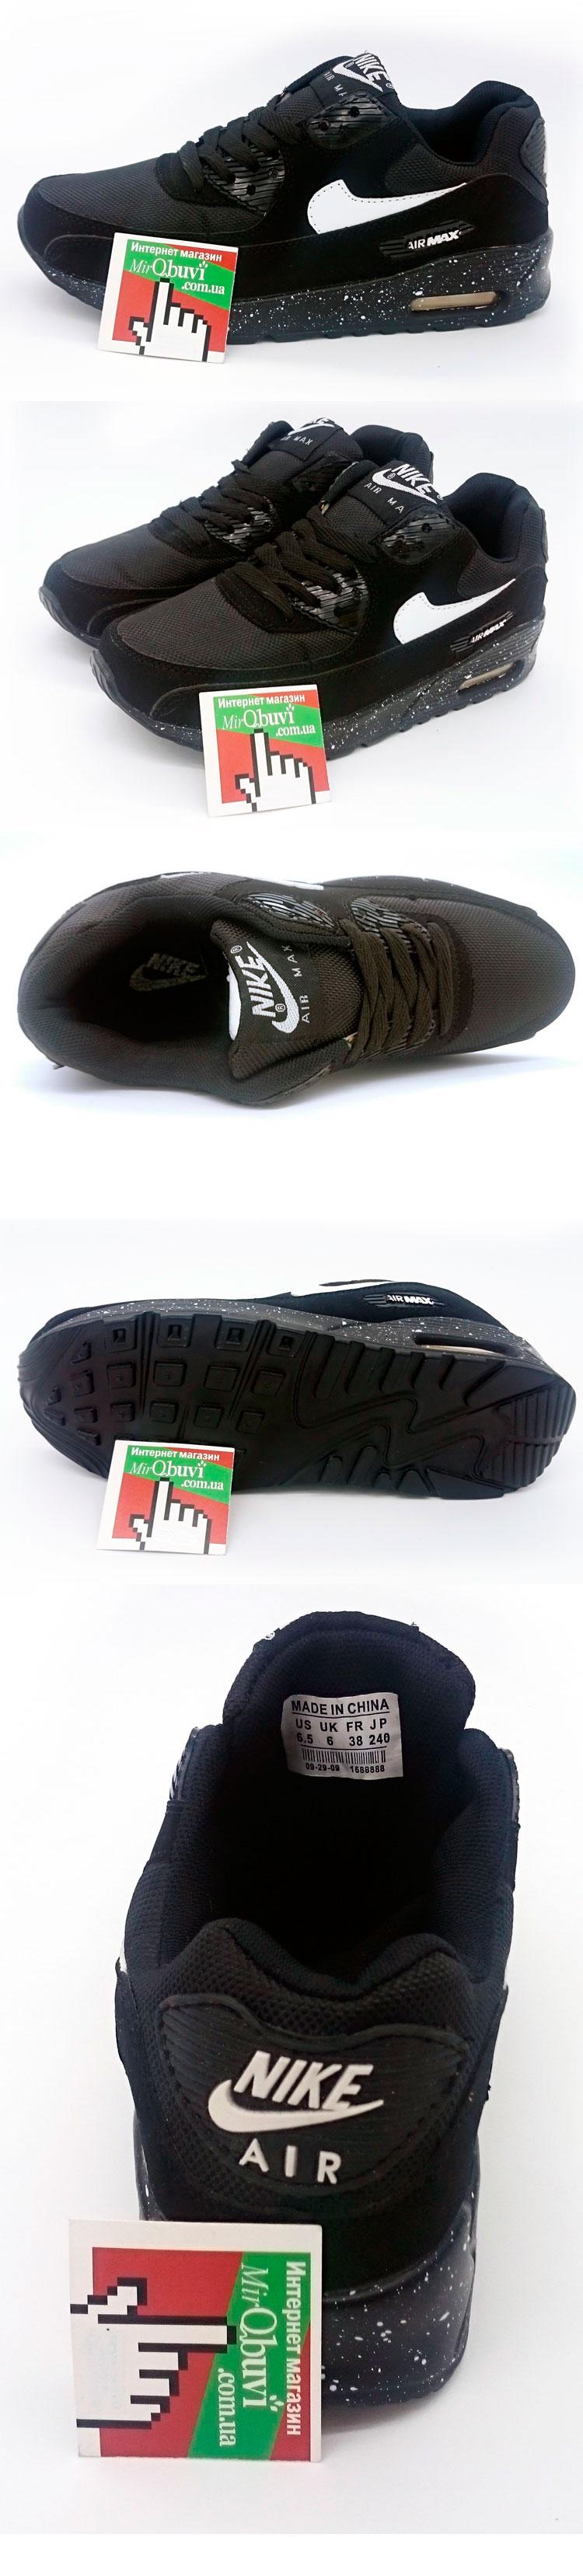 большое фото №5 Nike Air Max 90 all black